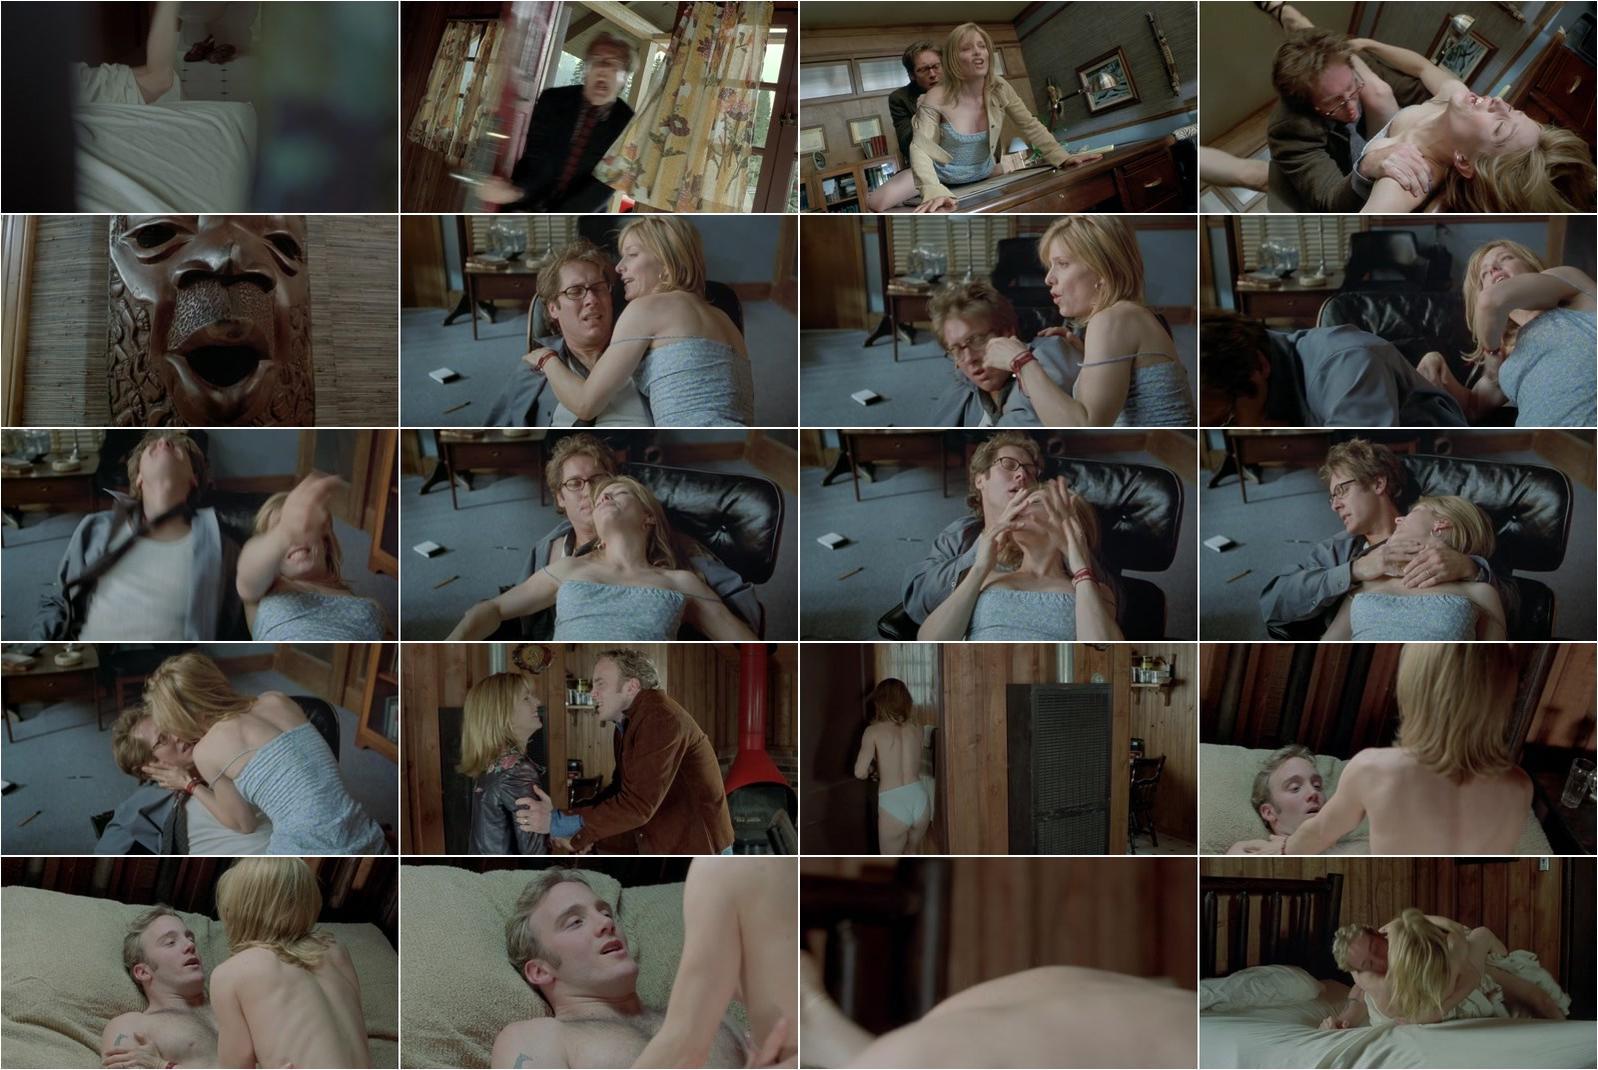 Shanti carson nude sex scene in shortbus scandalplanetcom - 3 part 6